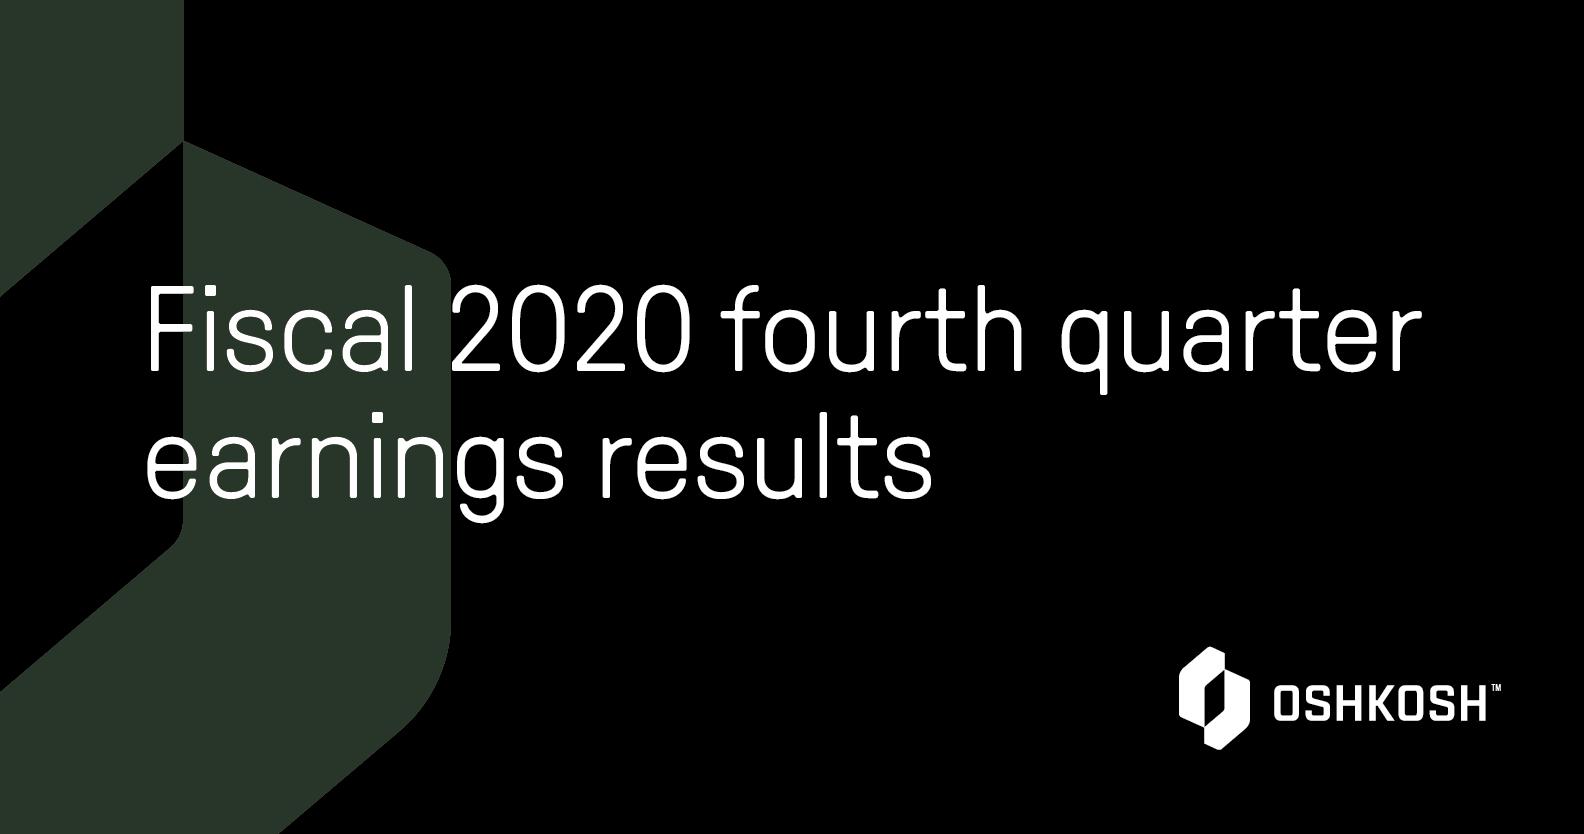 Green Oshkosh O mark with black background, white Oshkosh logo and white text that reads Fiscal 2020 fourth quarter earnings results